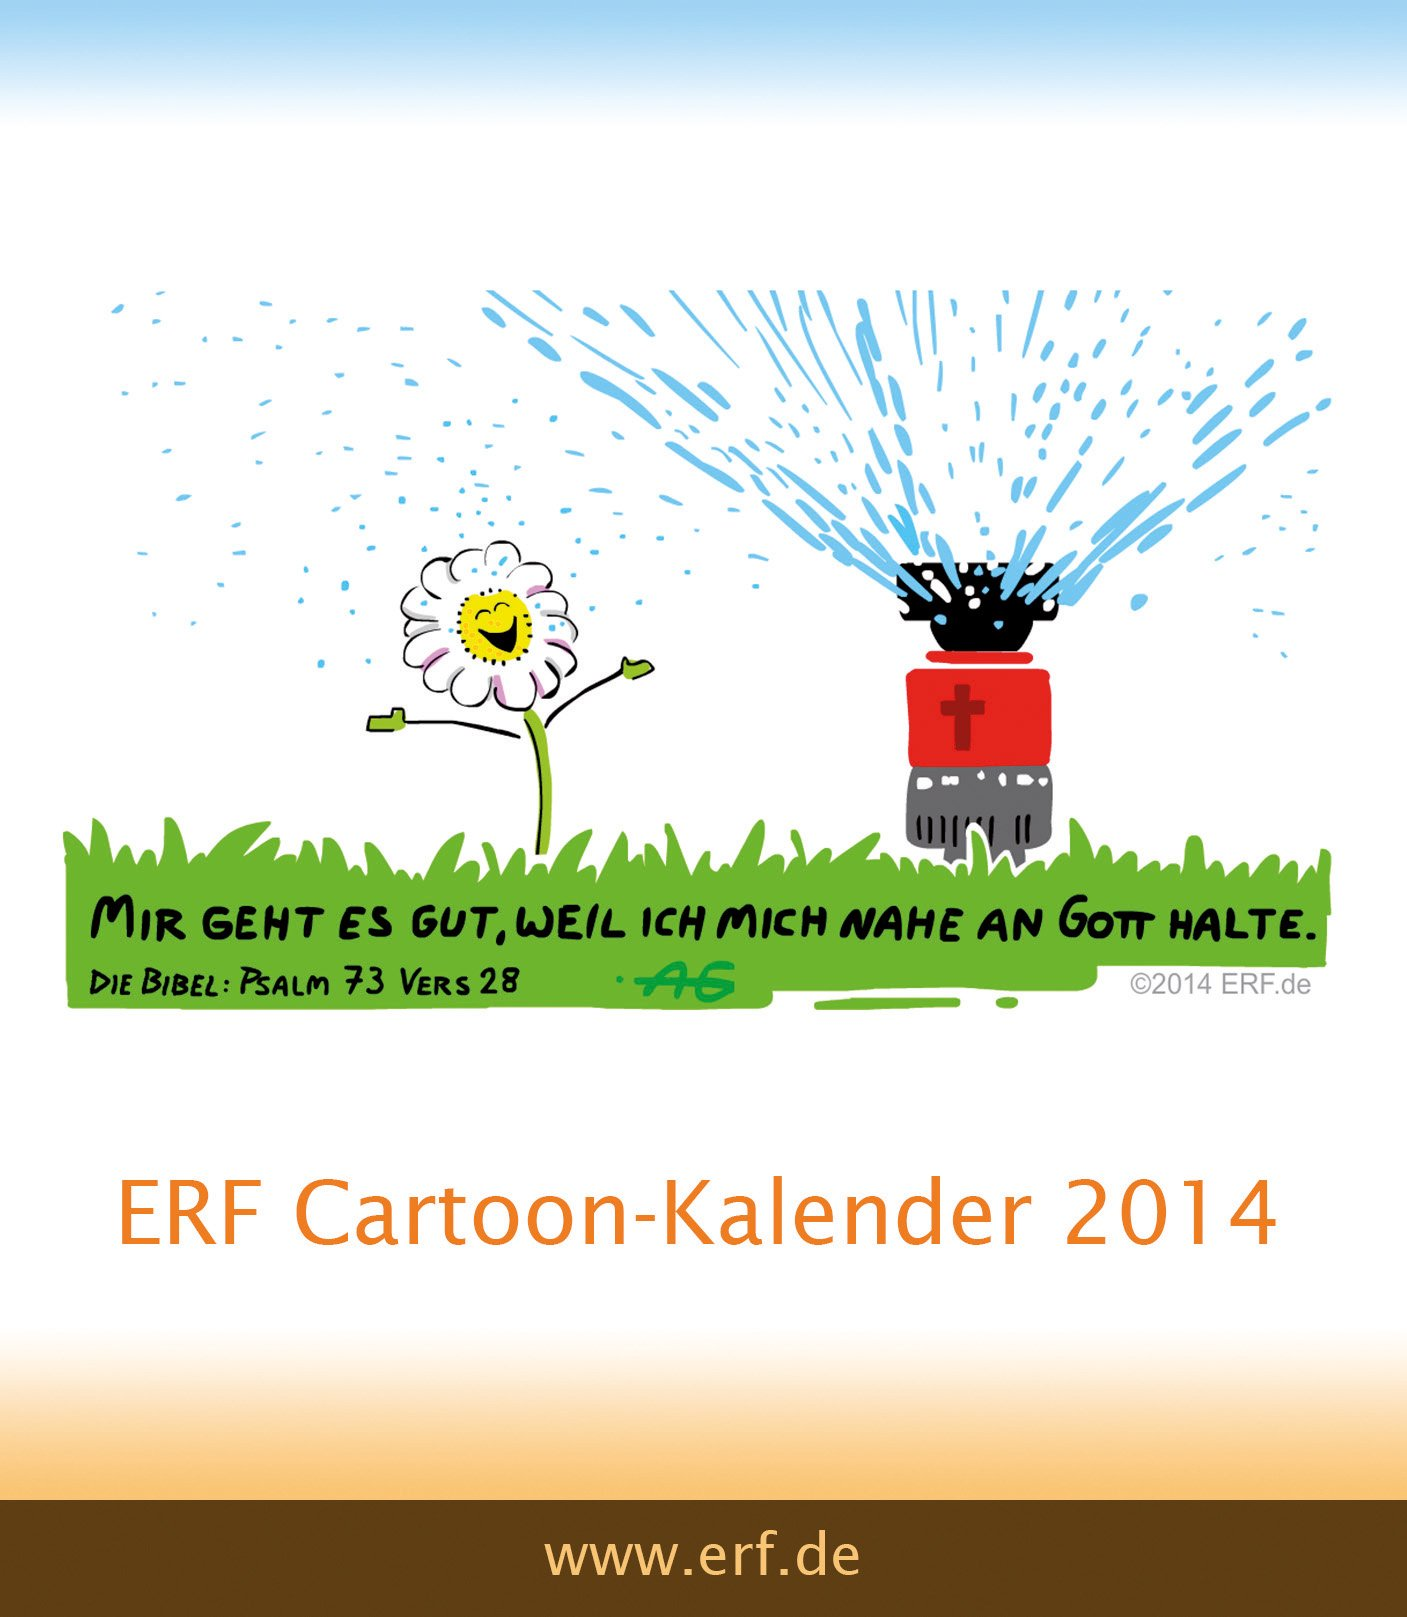 Der ERF Cartoon-Kalender 2014